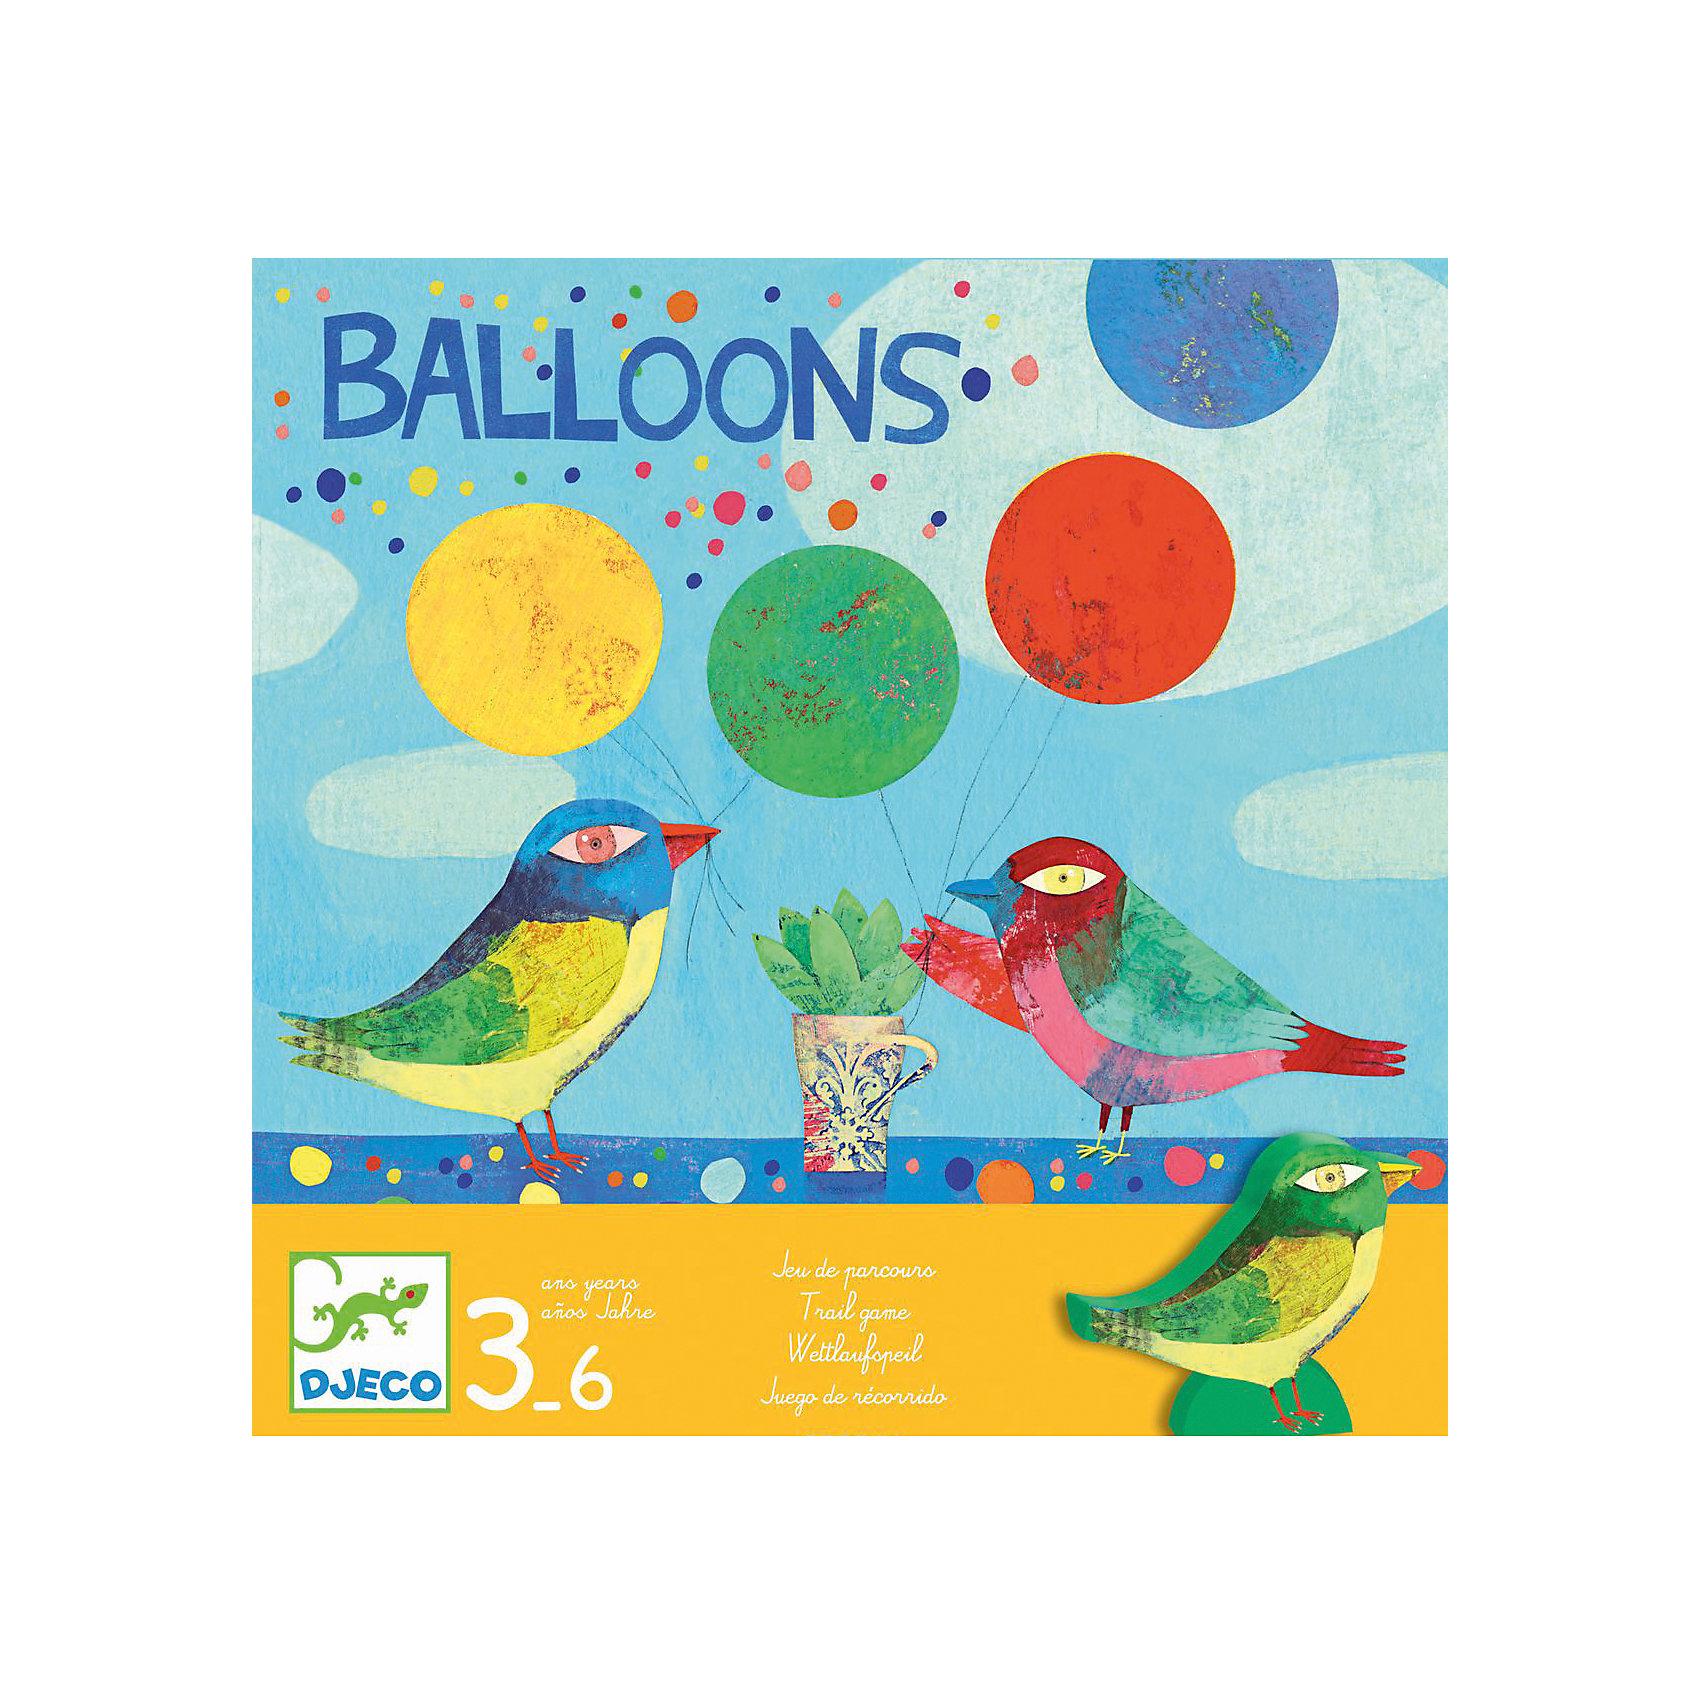 DJECO Настольная игра Воздушные шары, DJECO спортивный инвентарь djeco игра резиночка зайчик page 6